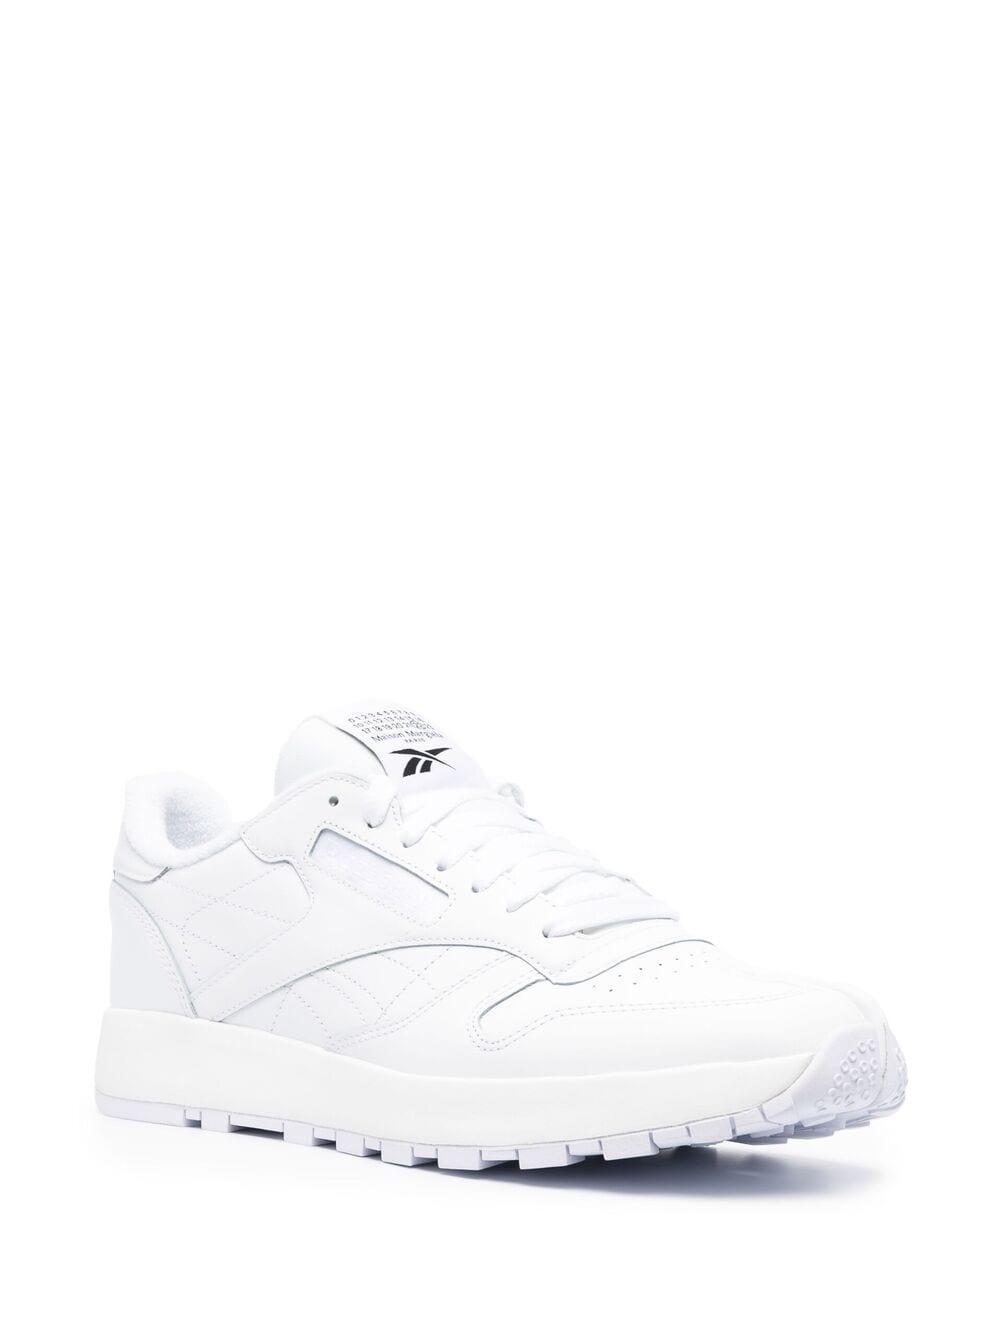 PROJECT 0 CL TABI REEBOK X MAISON MARGIELA | Sneakers | H04865WHITE